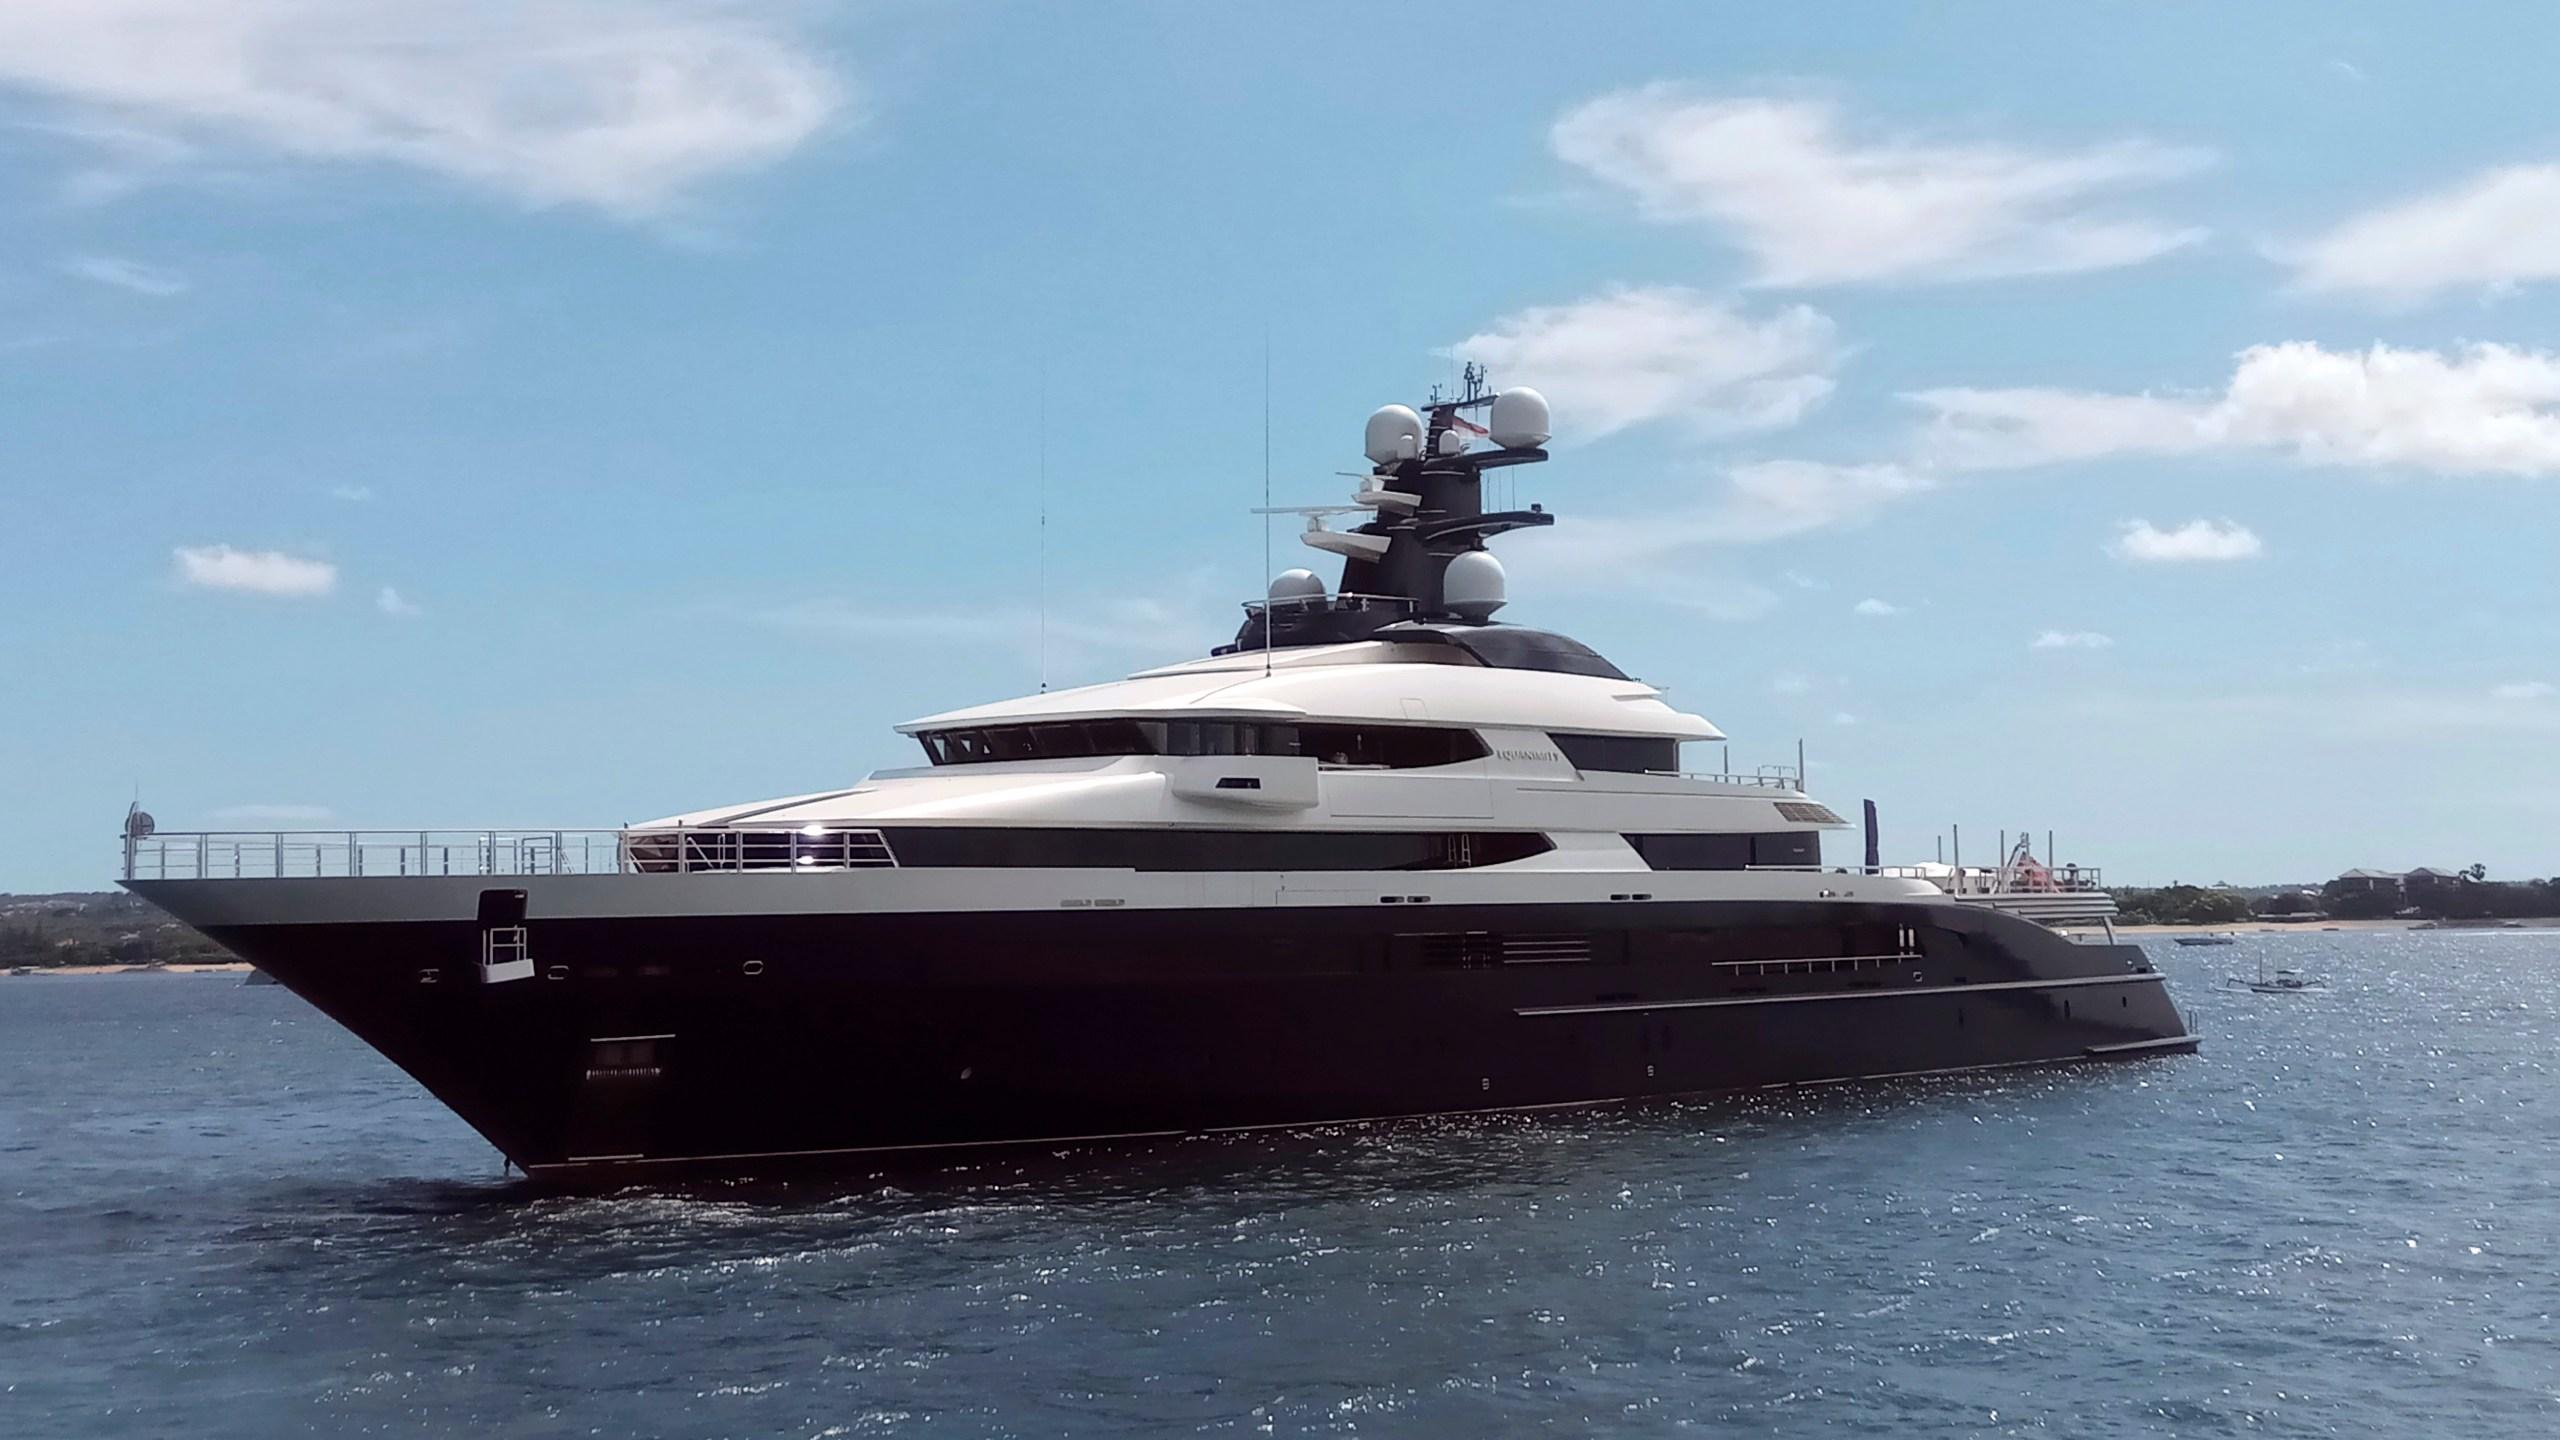 Indonesia_Malaysia_Luxury_Yacht_42096-159532.jpg95592336